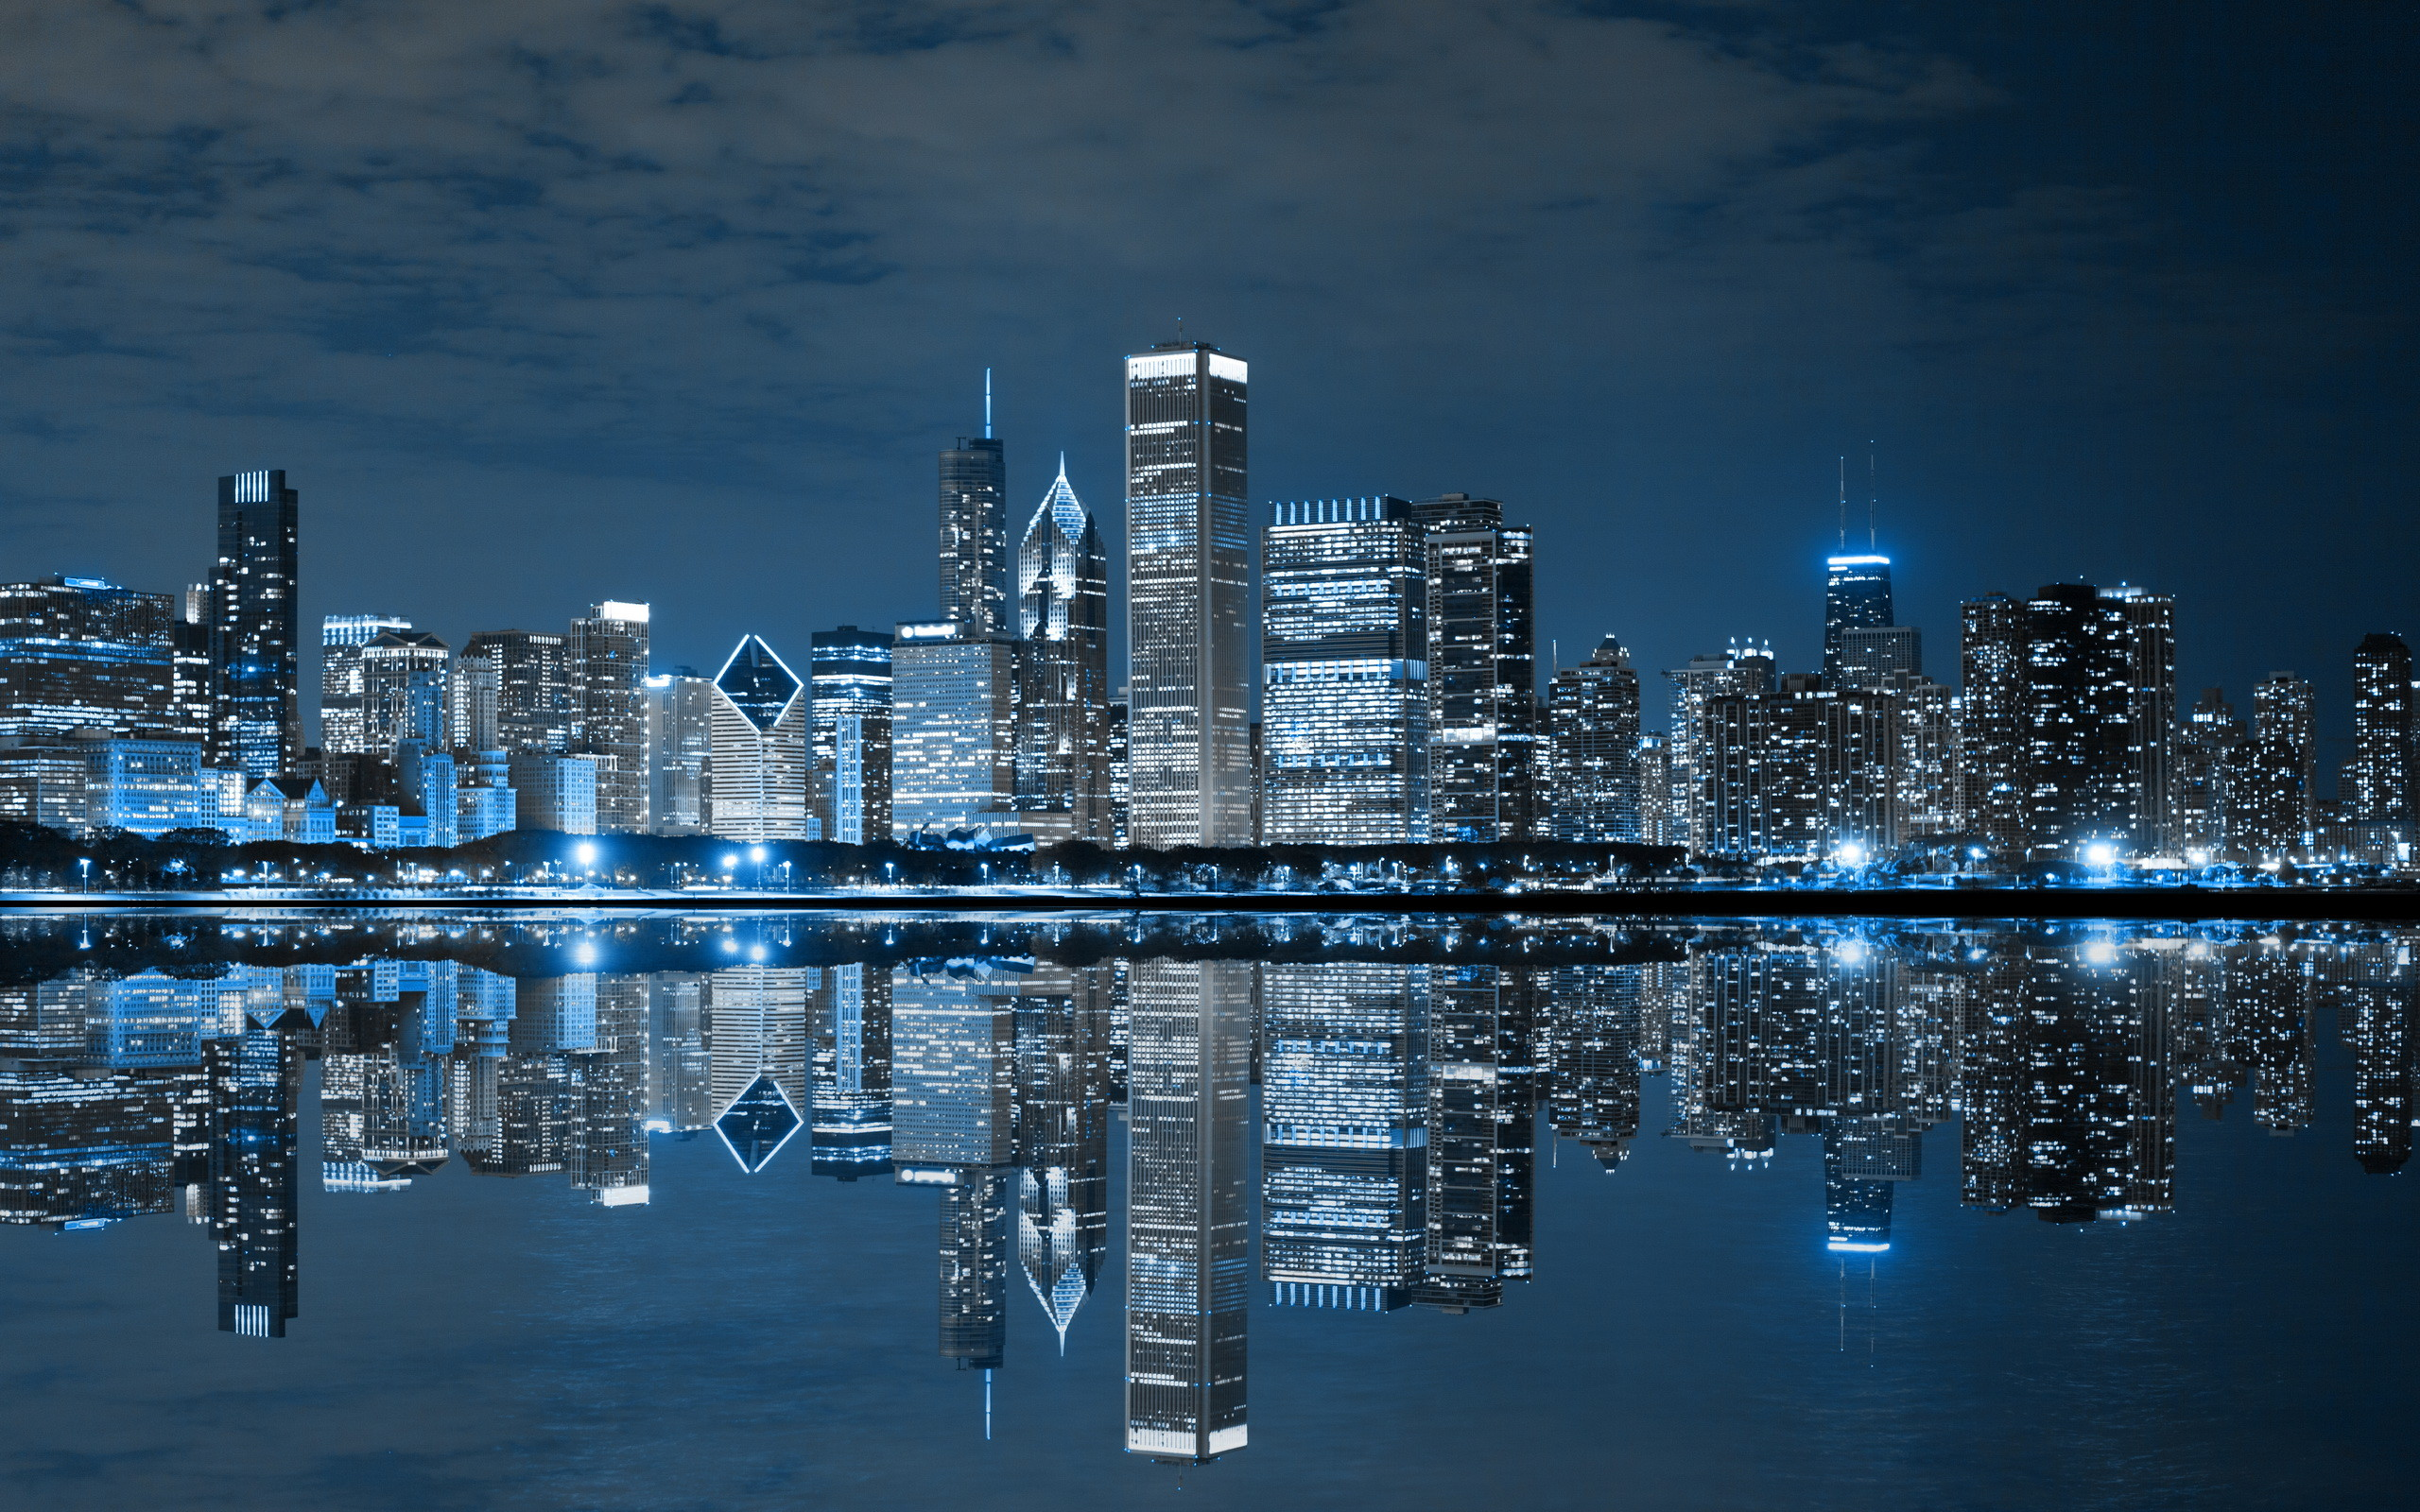 chicago wallpaper iphone 6 – Google Search   Desktop Wallpapers   Pinterest    Chicago wallpaper